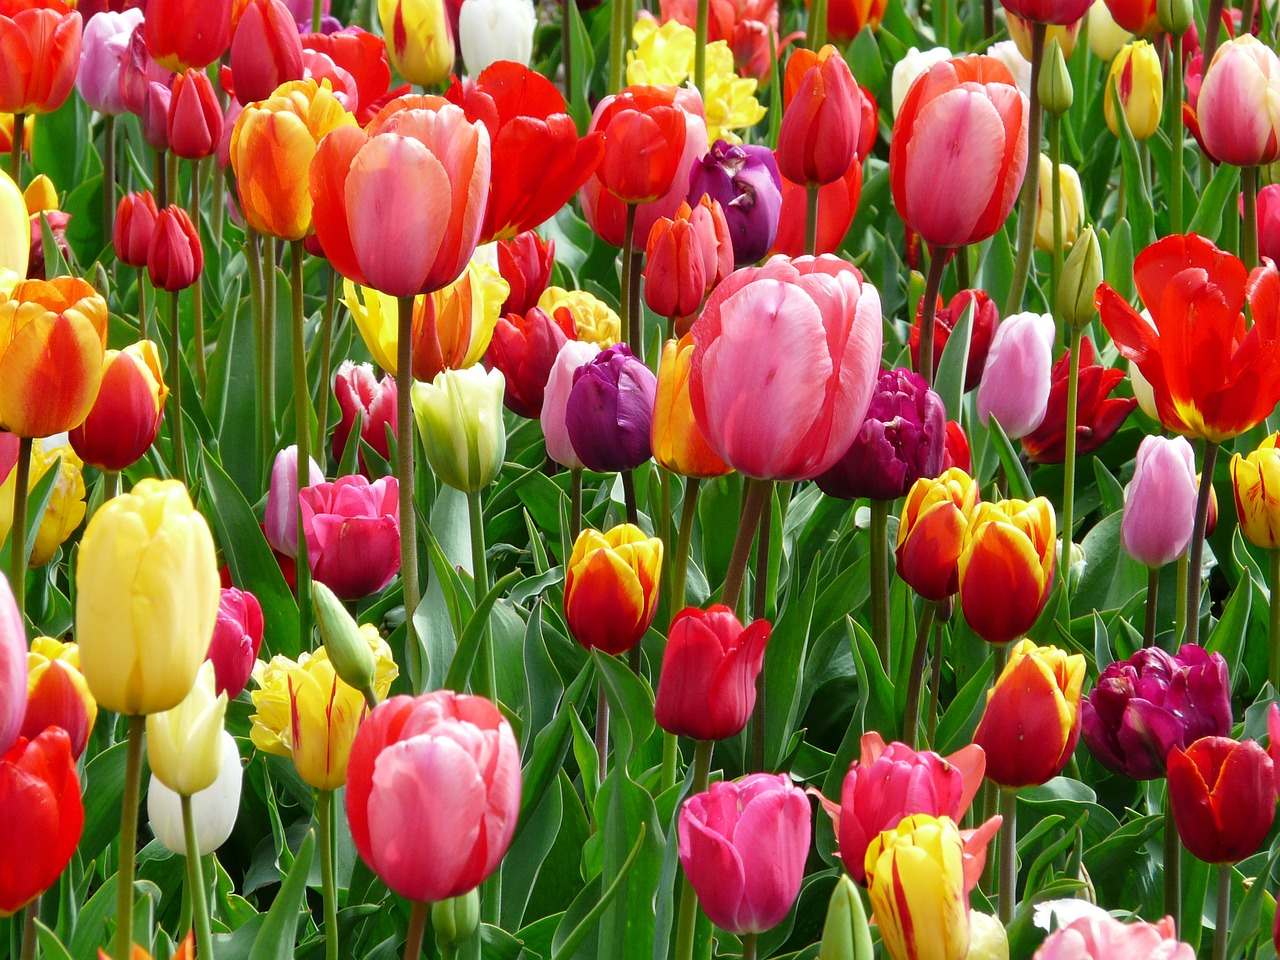 tulips-52126_1280